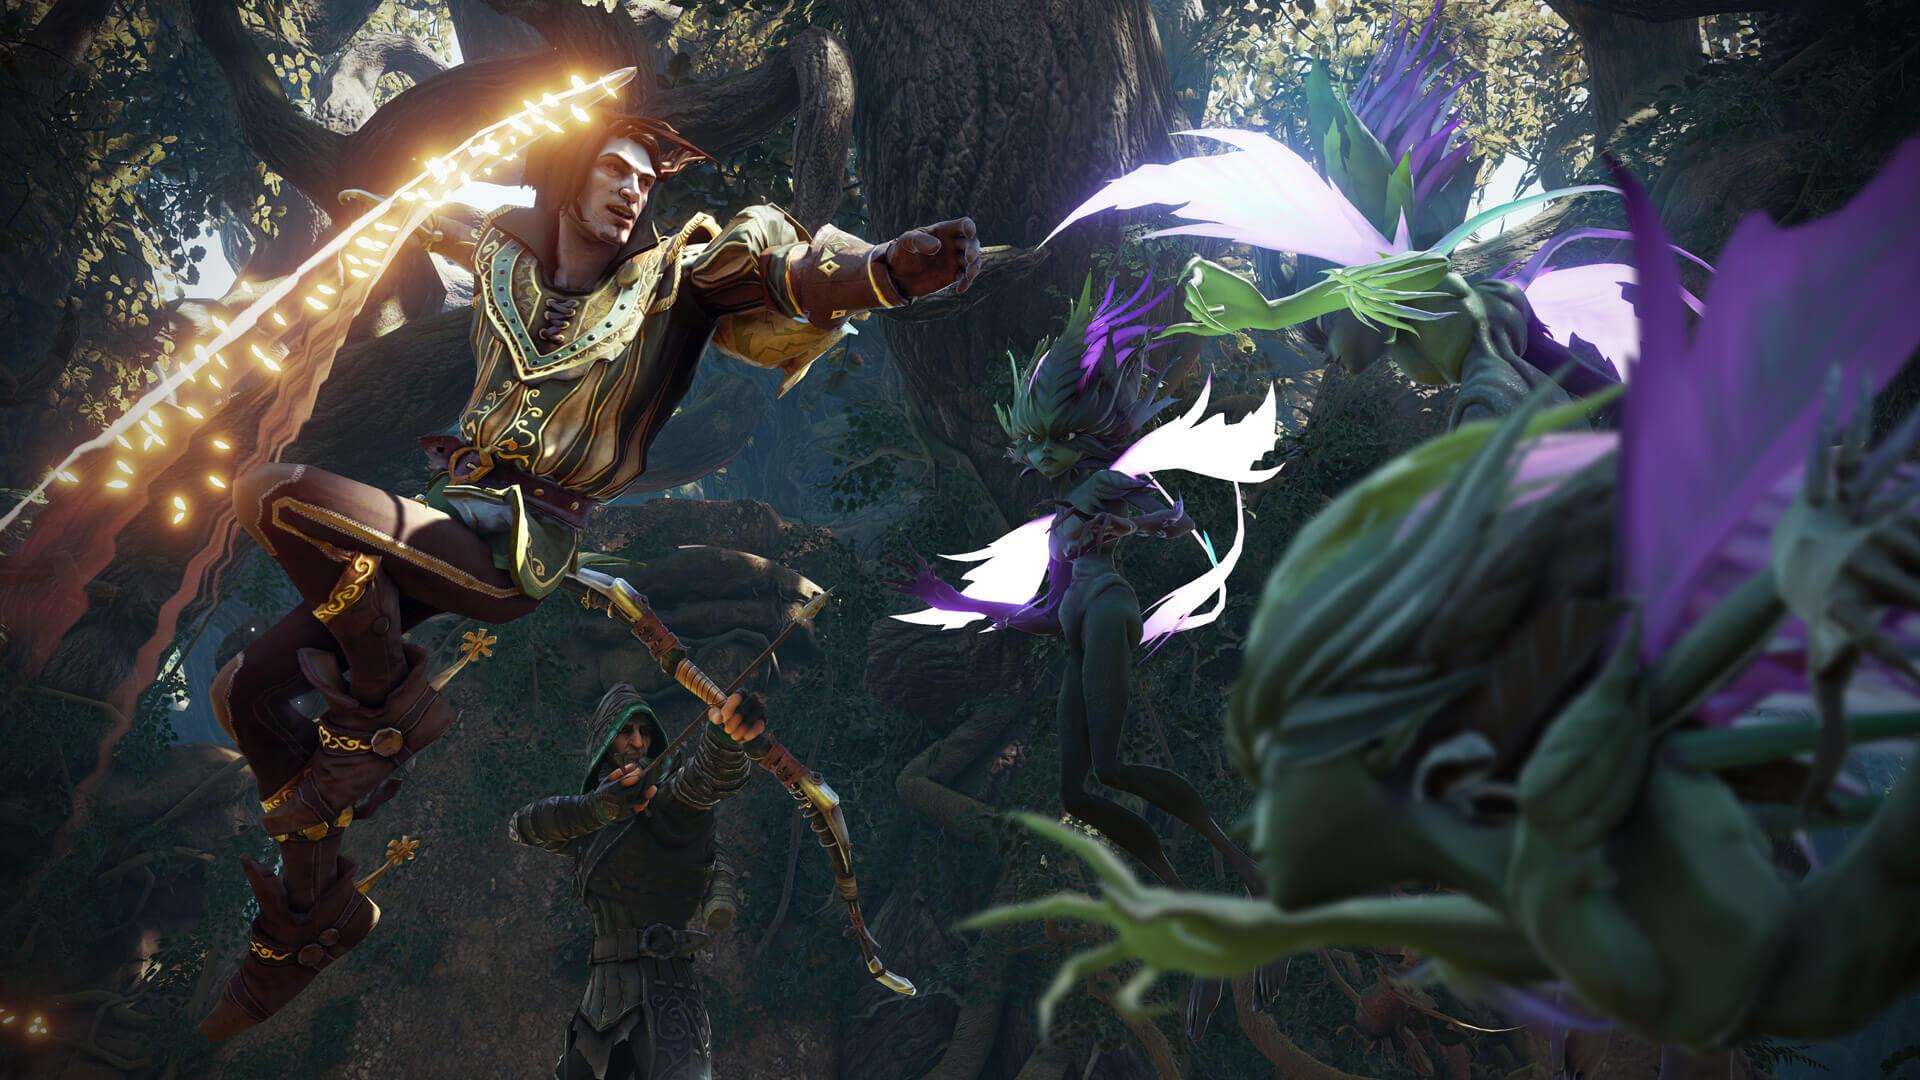 Fable of legends bruker Unreal Engine 4 - i likhet med svært mange kommende spill til DirectX 12.